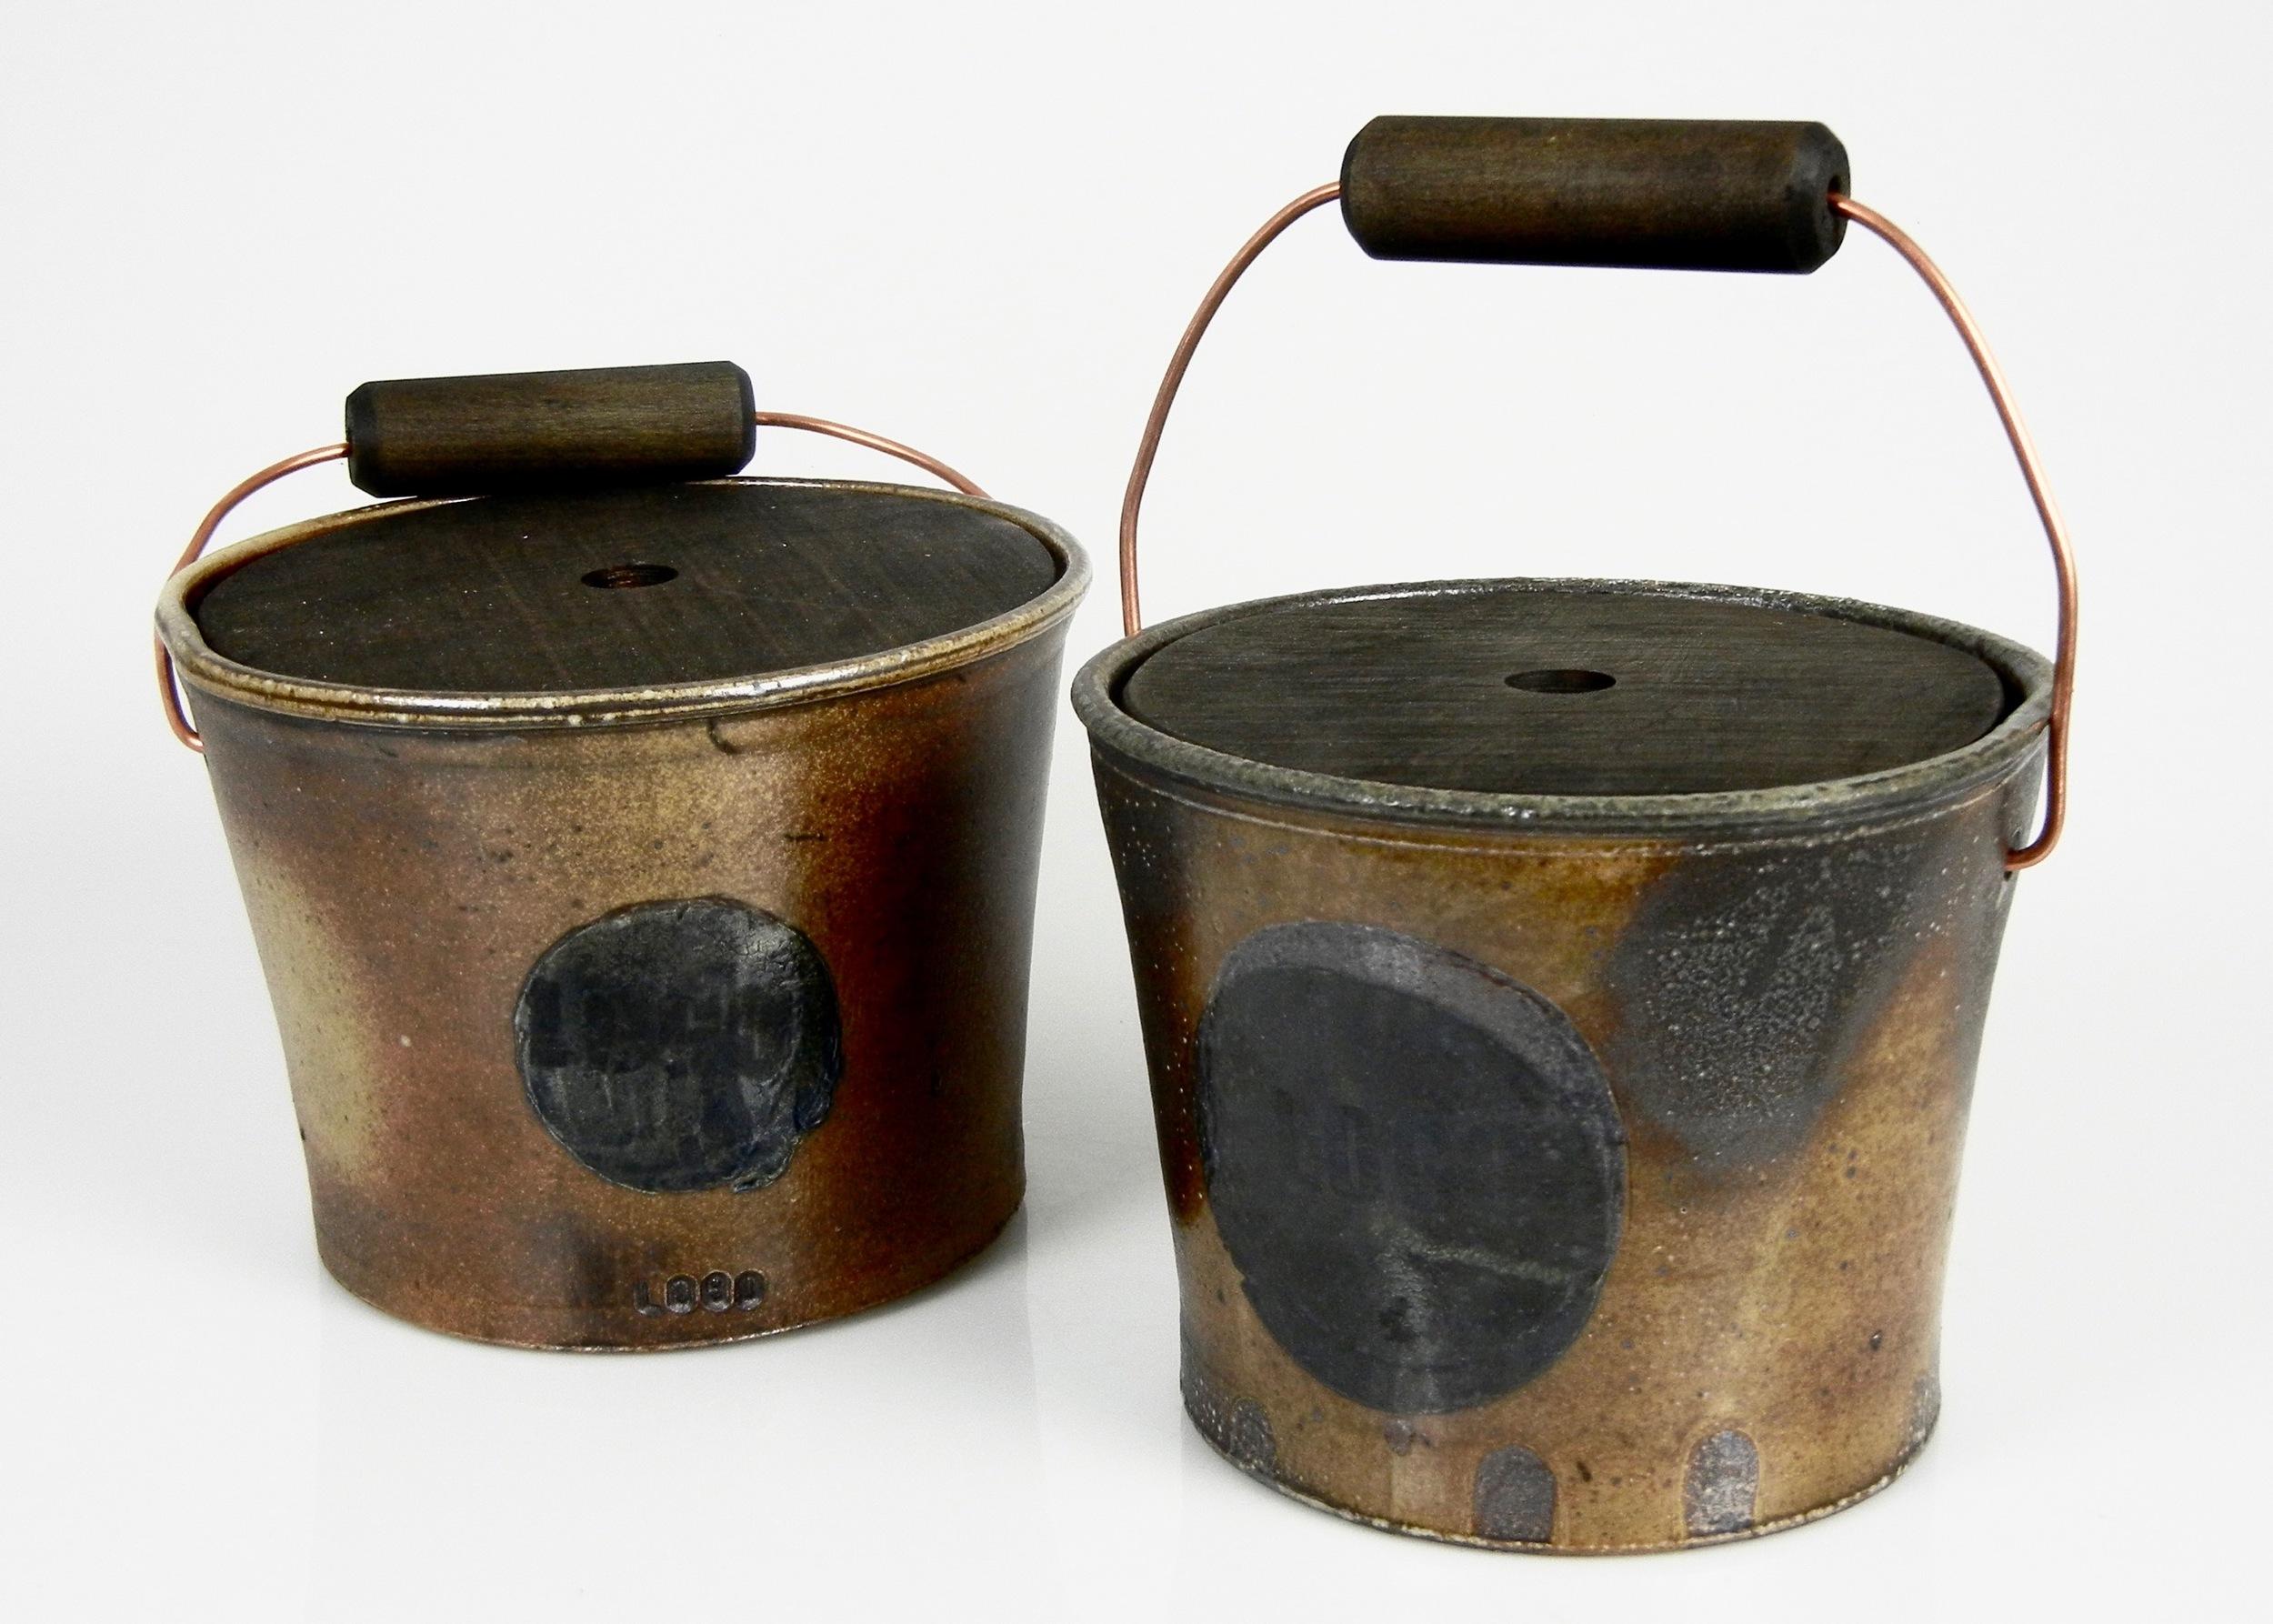 Lorenz Pottery, ceramics, pottery, folk pottery, wood fired, soda fired, bucket, logo